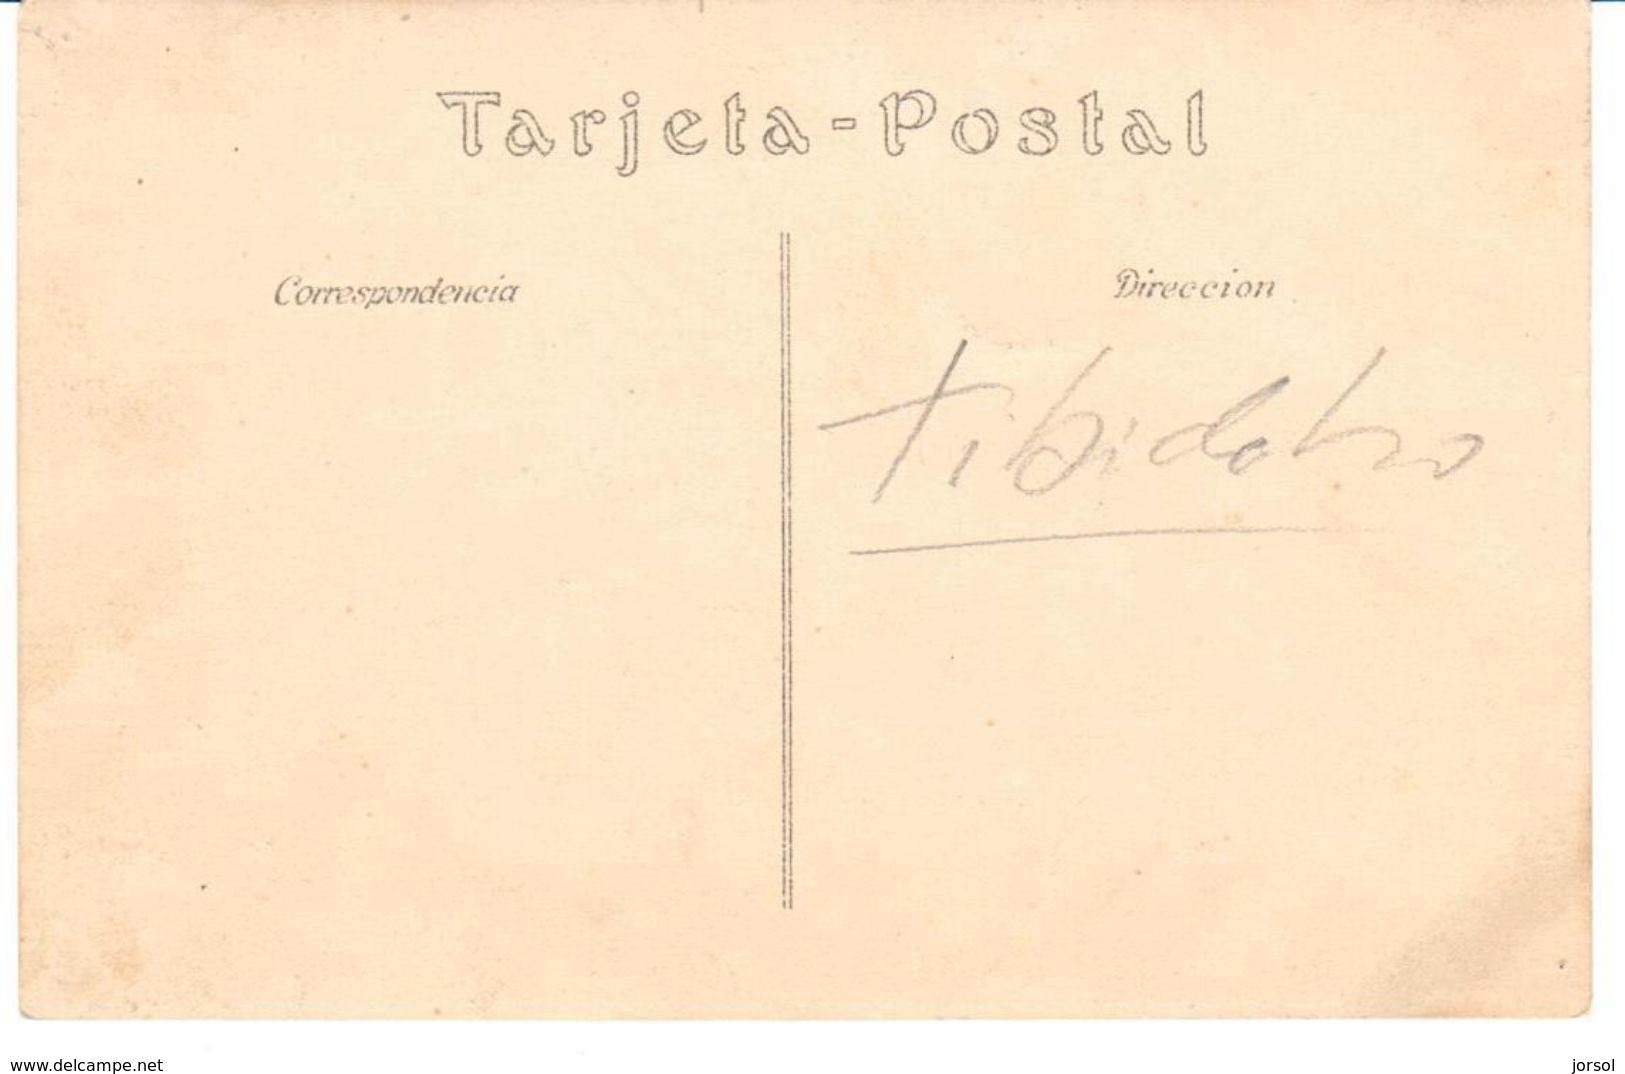 POSTAL   FOTOGRAFIA DE UNA REUNION EN EL TIBIDABO - Fotografía